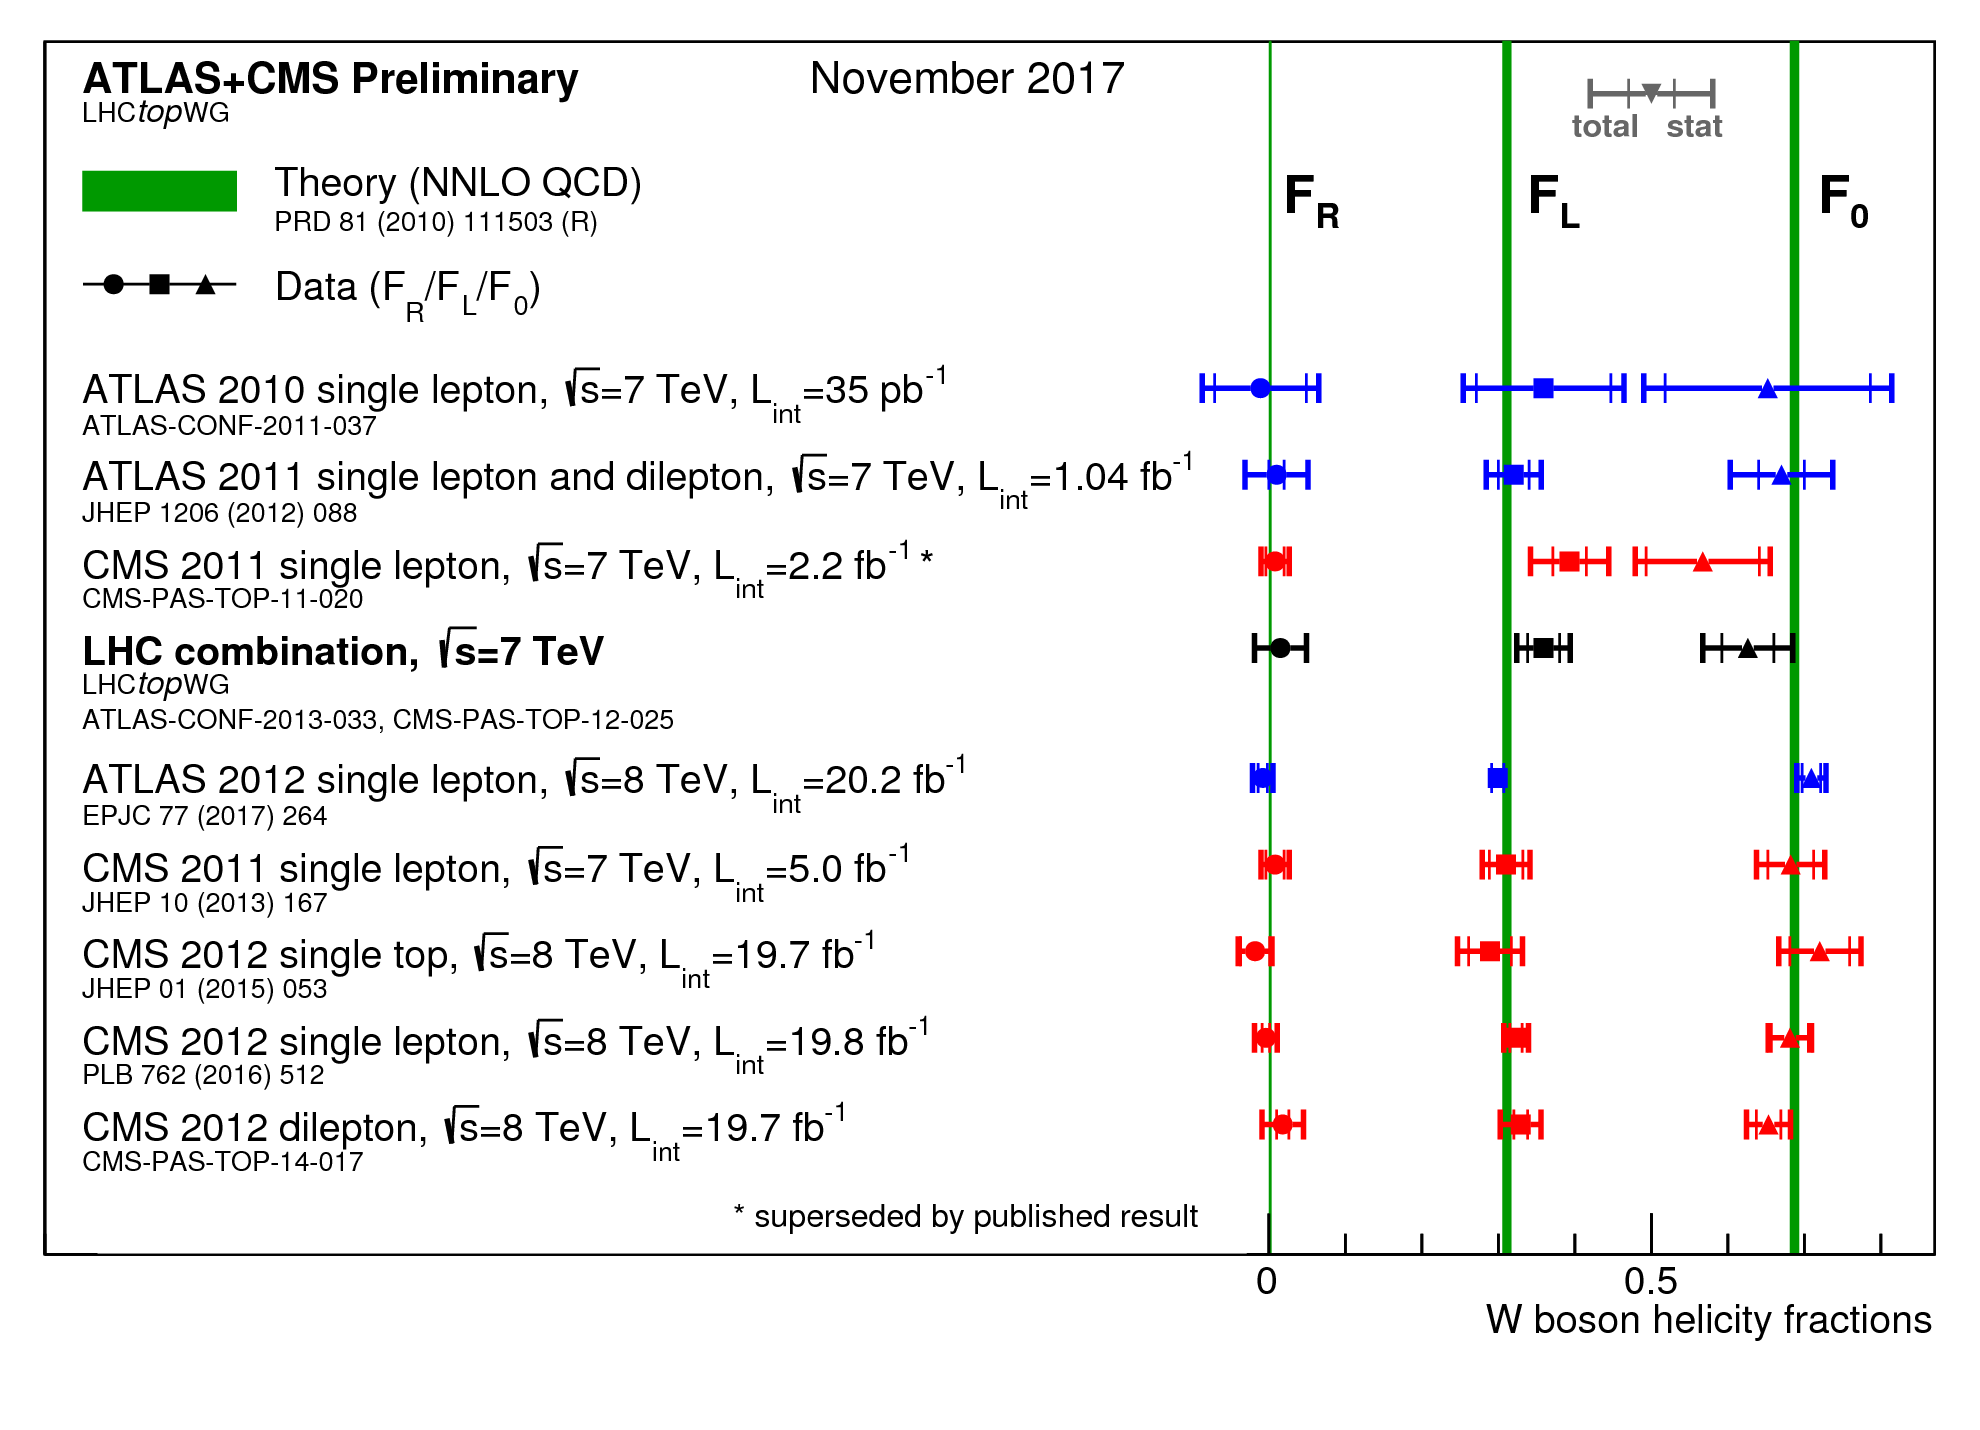 https://atlas.web.cern.ch/Atlas/GROUPS/PHYSICS/CombinedSummaryPlots/TOP/whelicity_LHC/whelicity_LHC.png